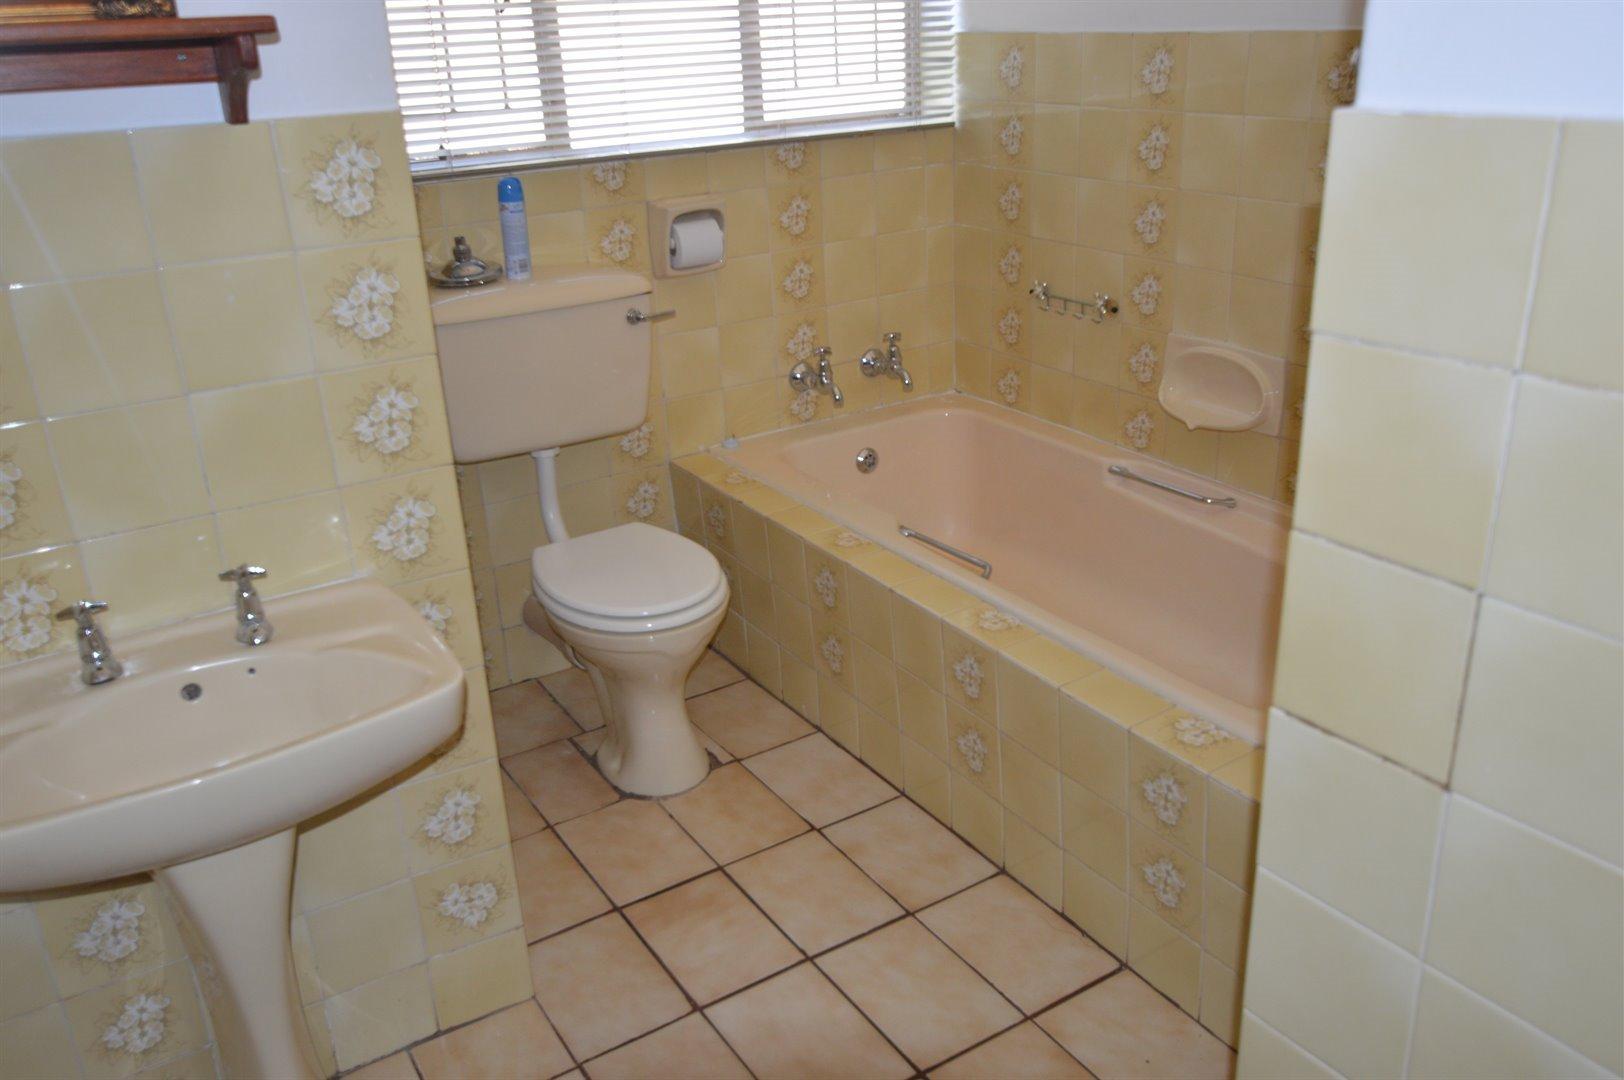 Vanderbijlpark Se 2 property for sale. Ref No: 13623209. Picture no 9